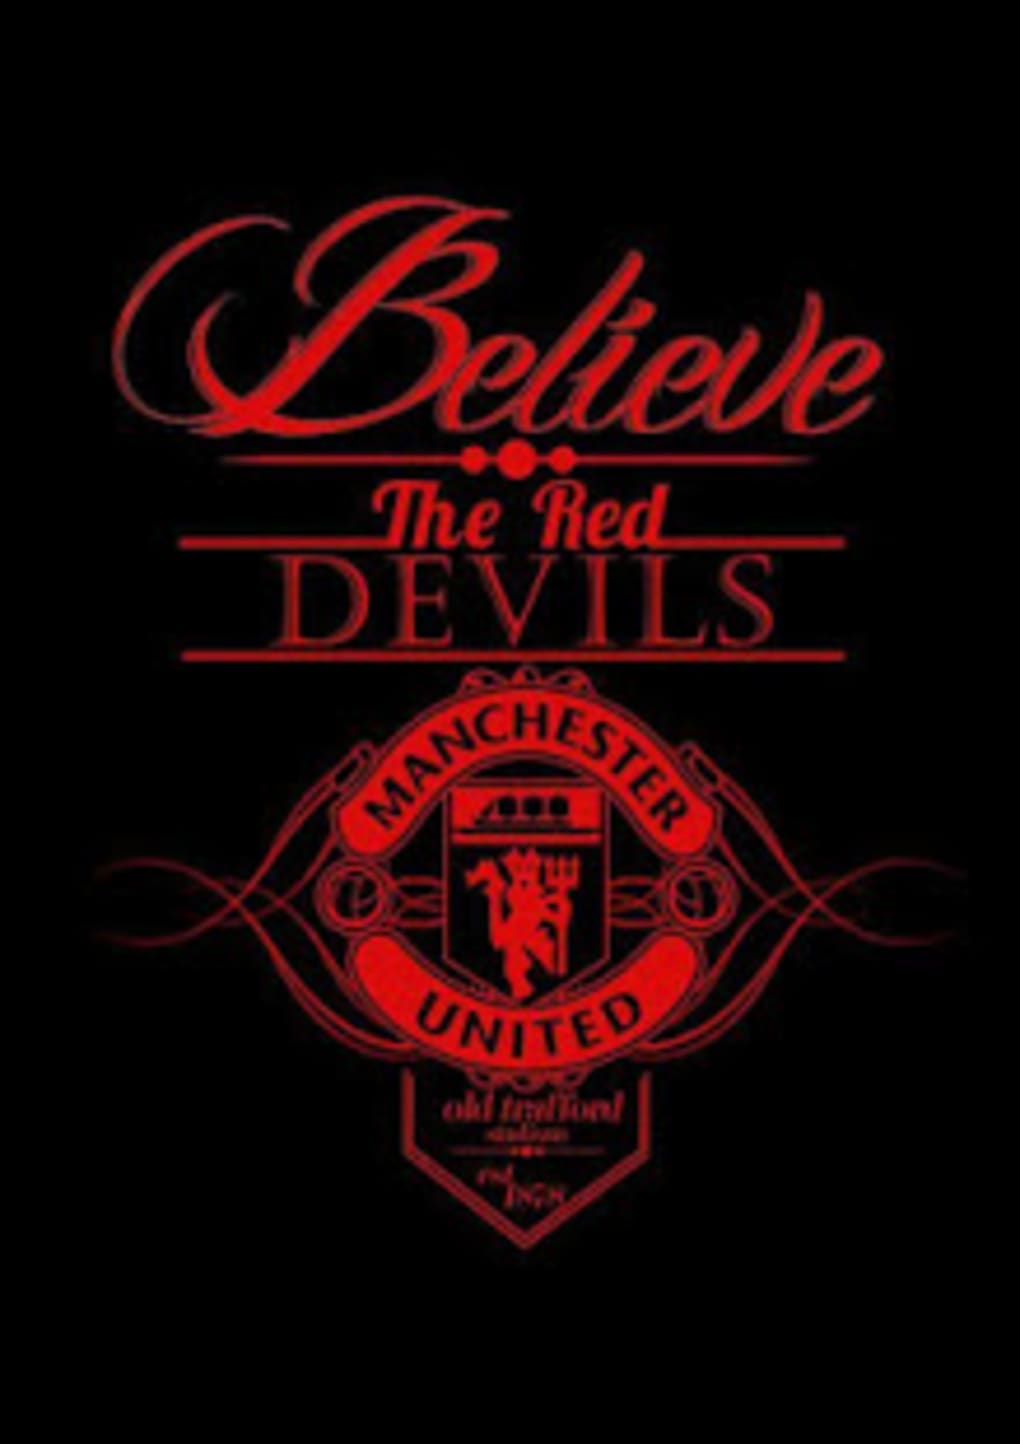 Man Utd Logo Wallpaper / Manchester United Logo Wallpaper ...